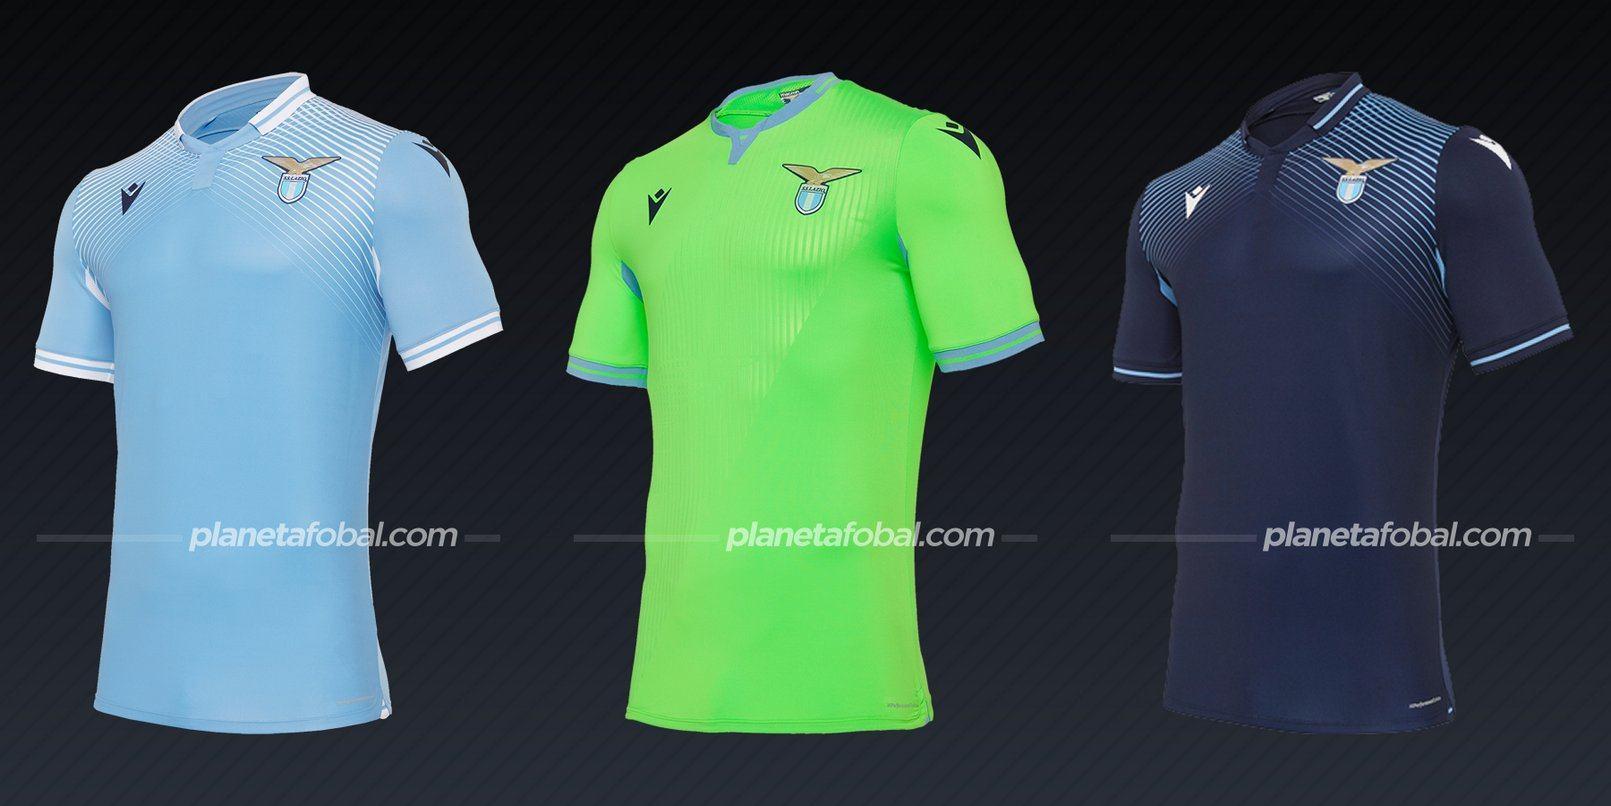 SS Lazio (Macron) | Camisetas de la Serie A 2020/2021